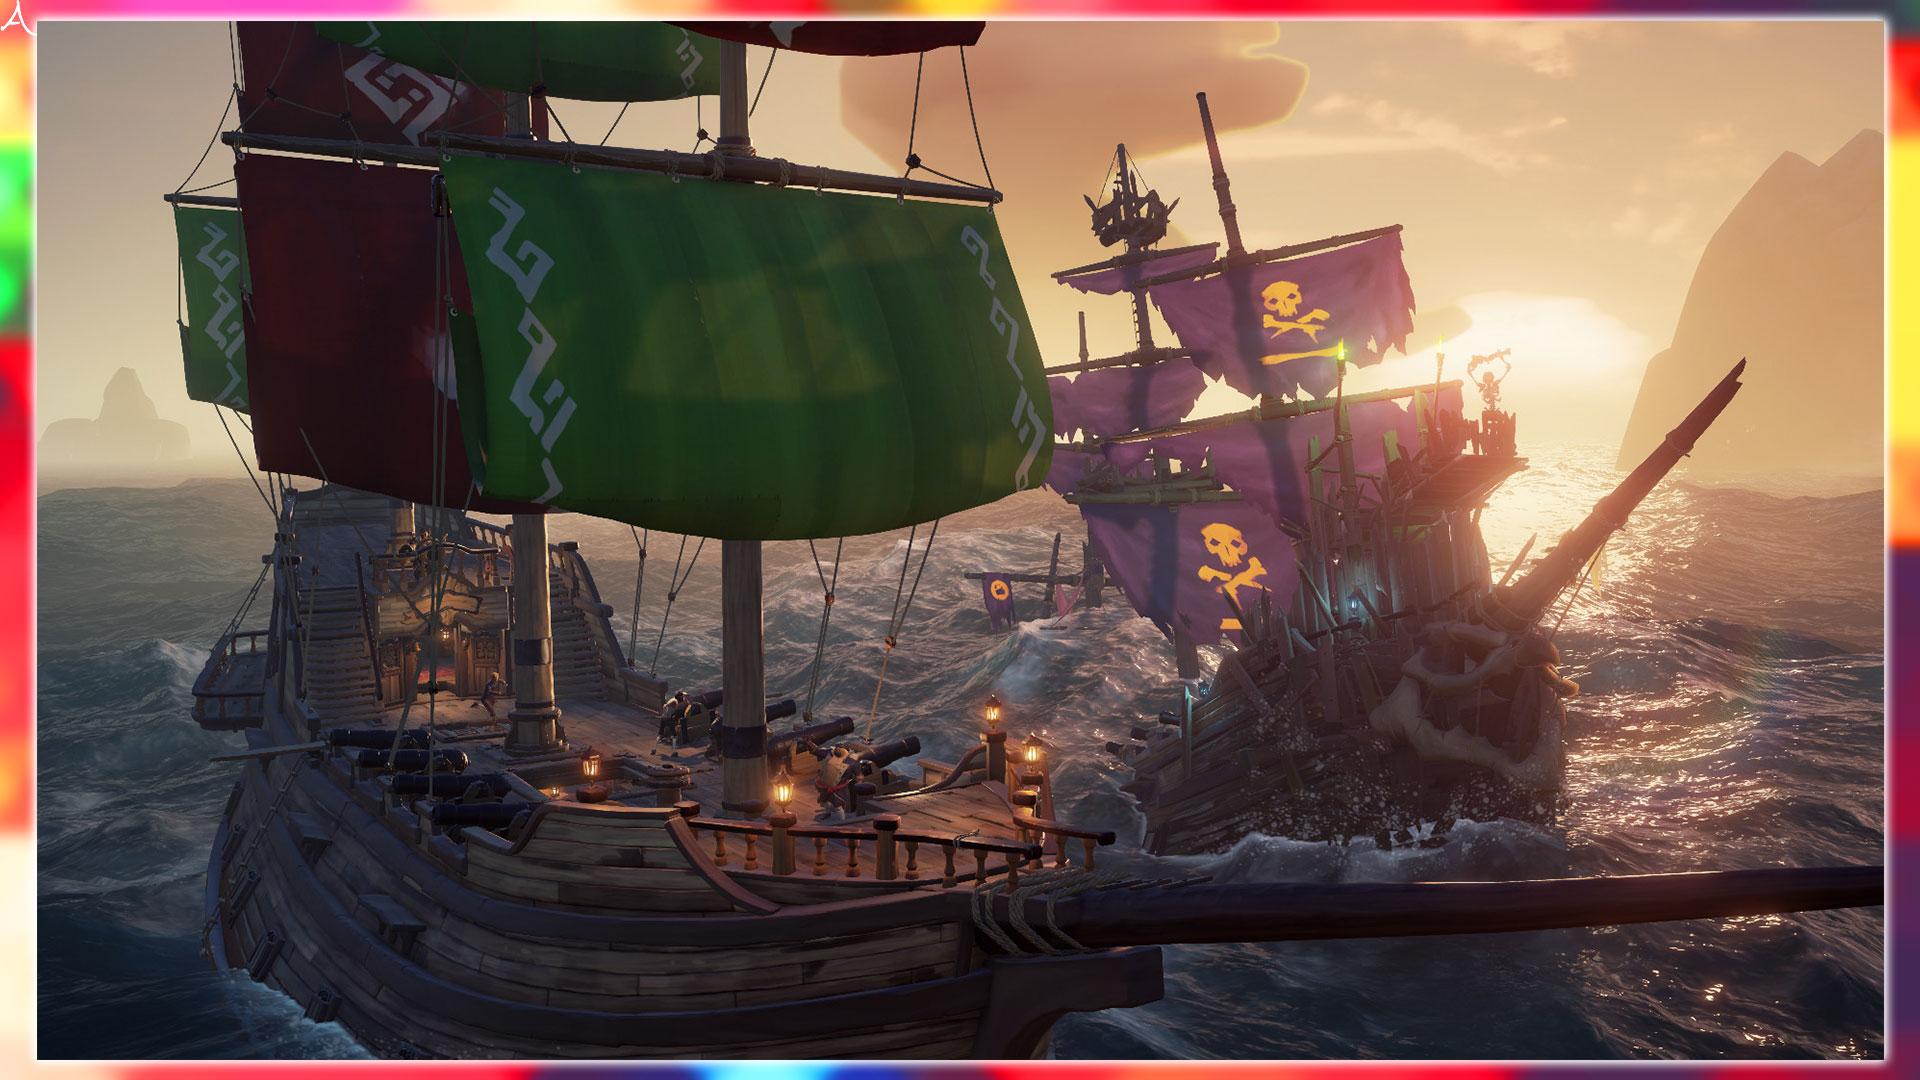 PC版「Sea of Thieves」に必要な最低/推奨スペックを確認:快適プレイに必要な値段はどれくらい?